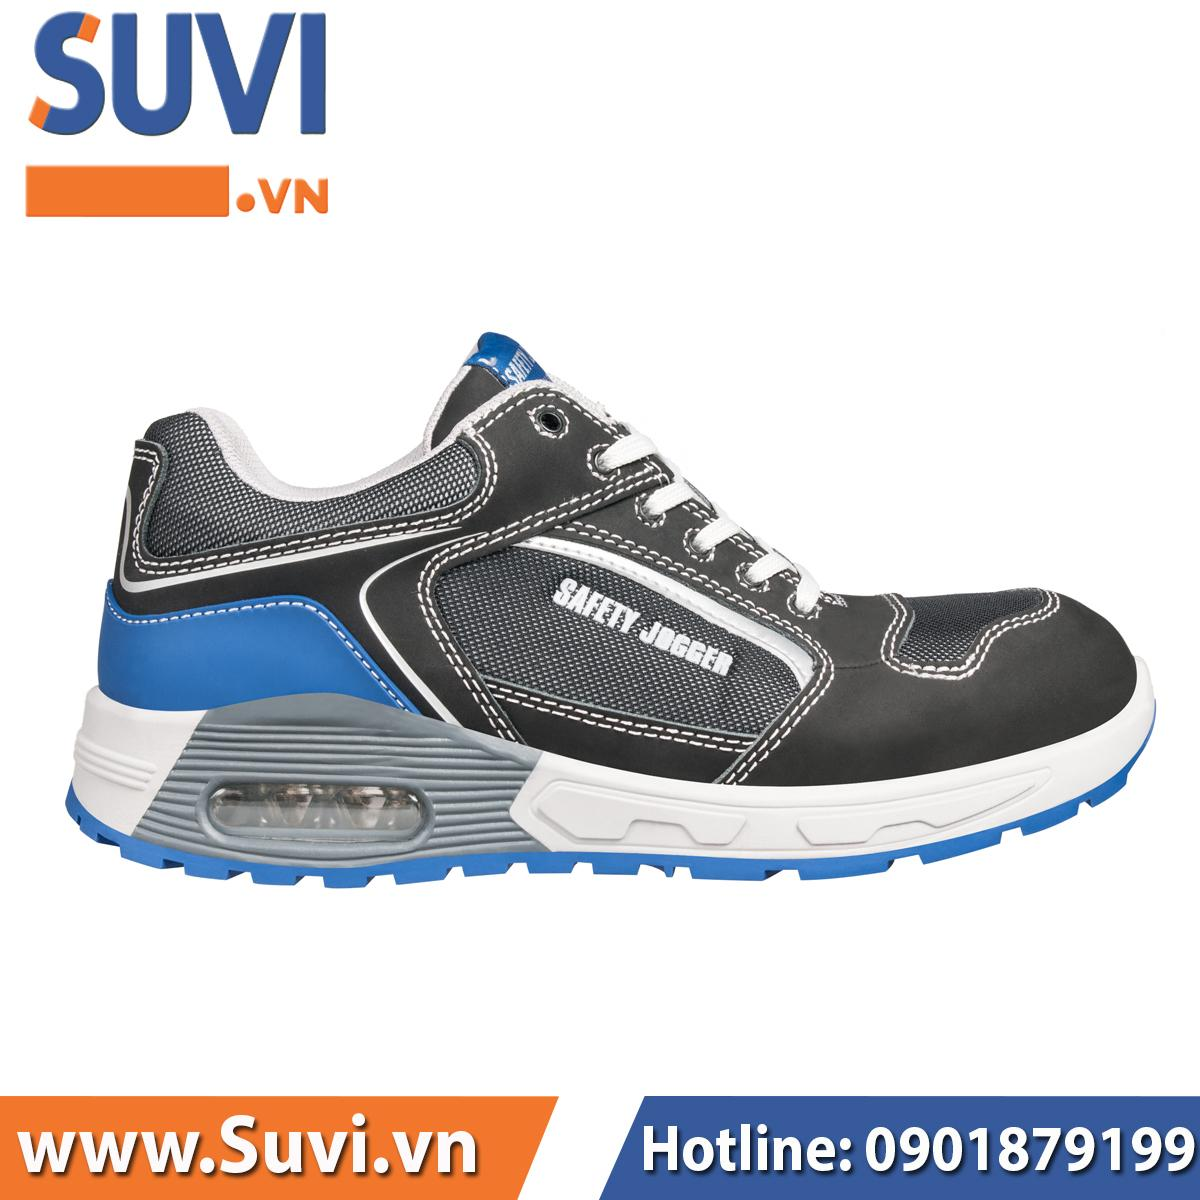 Giày Bảo Hộ Thời Trang Safety Jogger Raptor S3 size 40